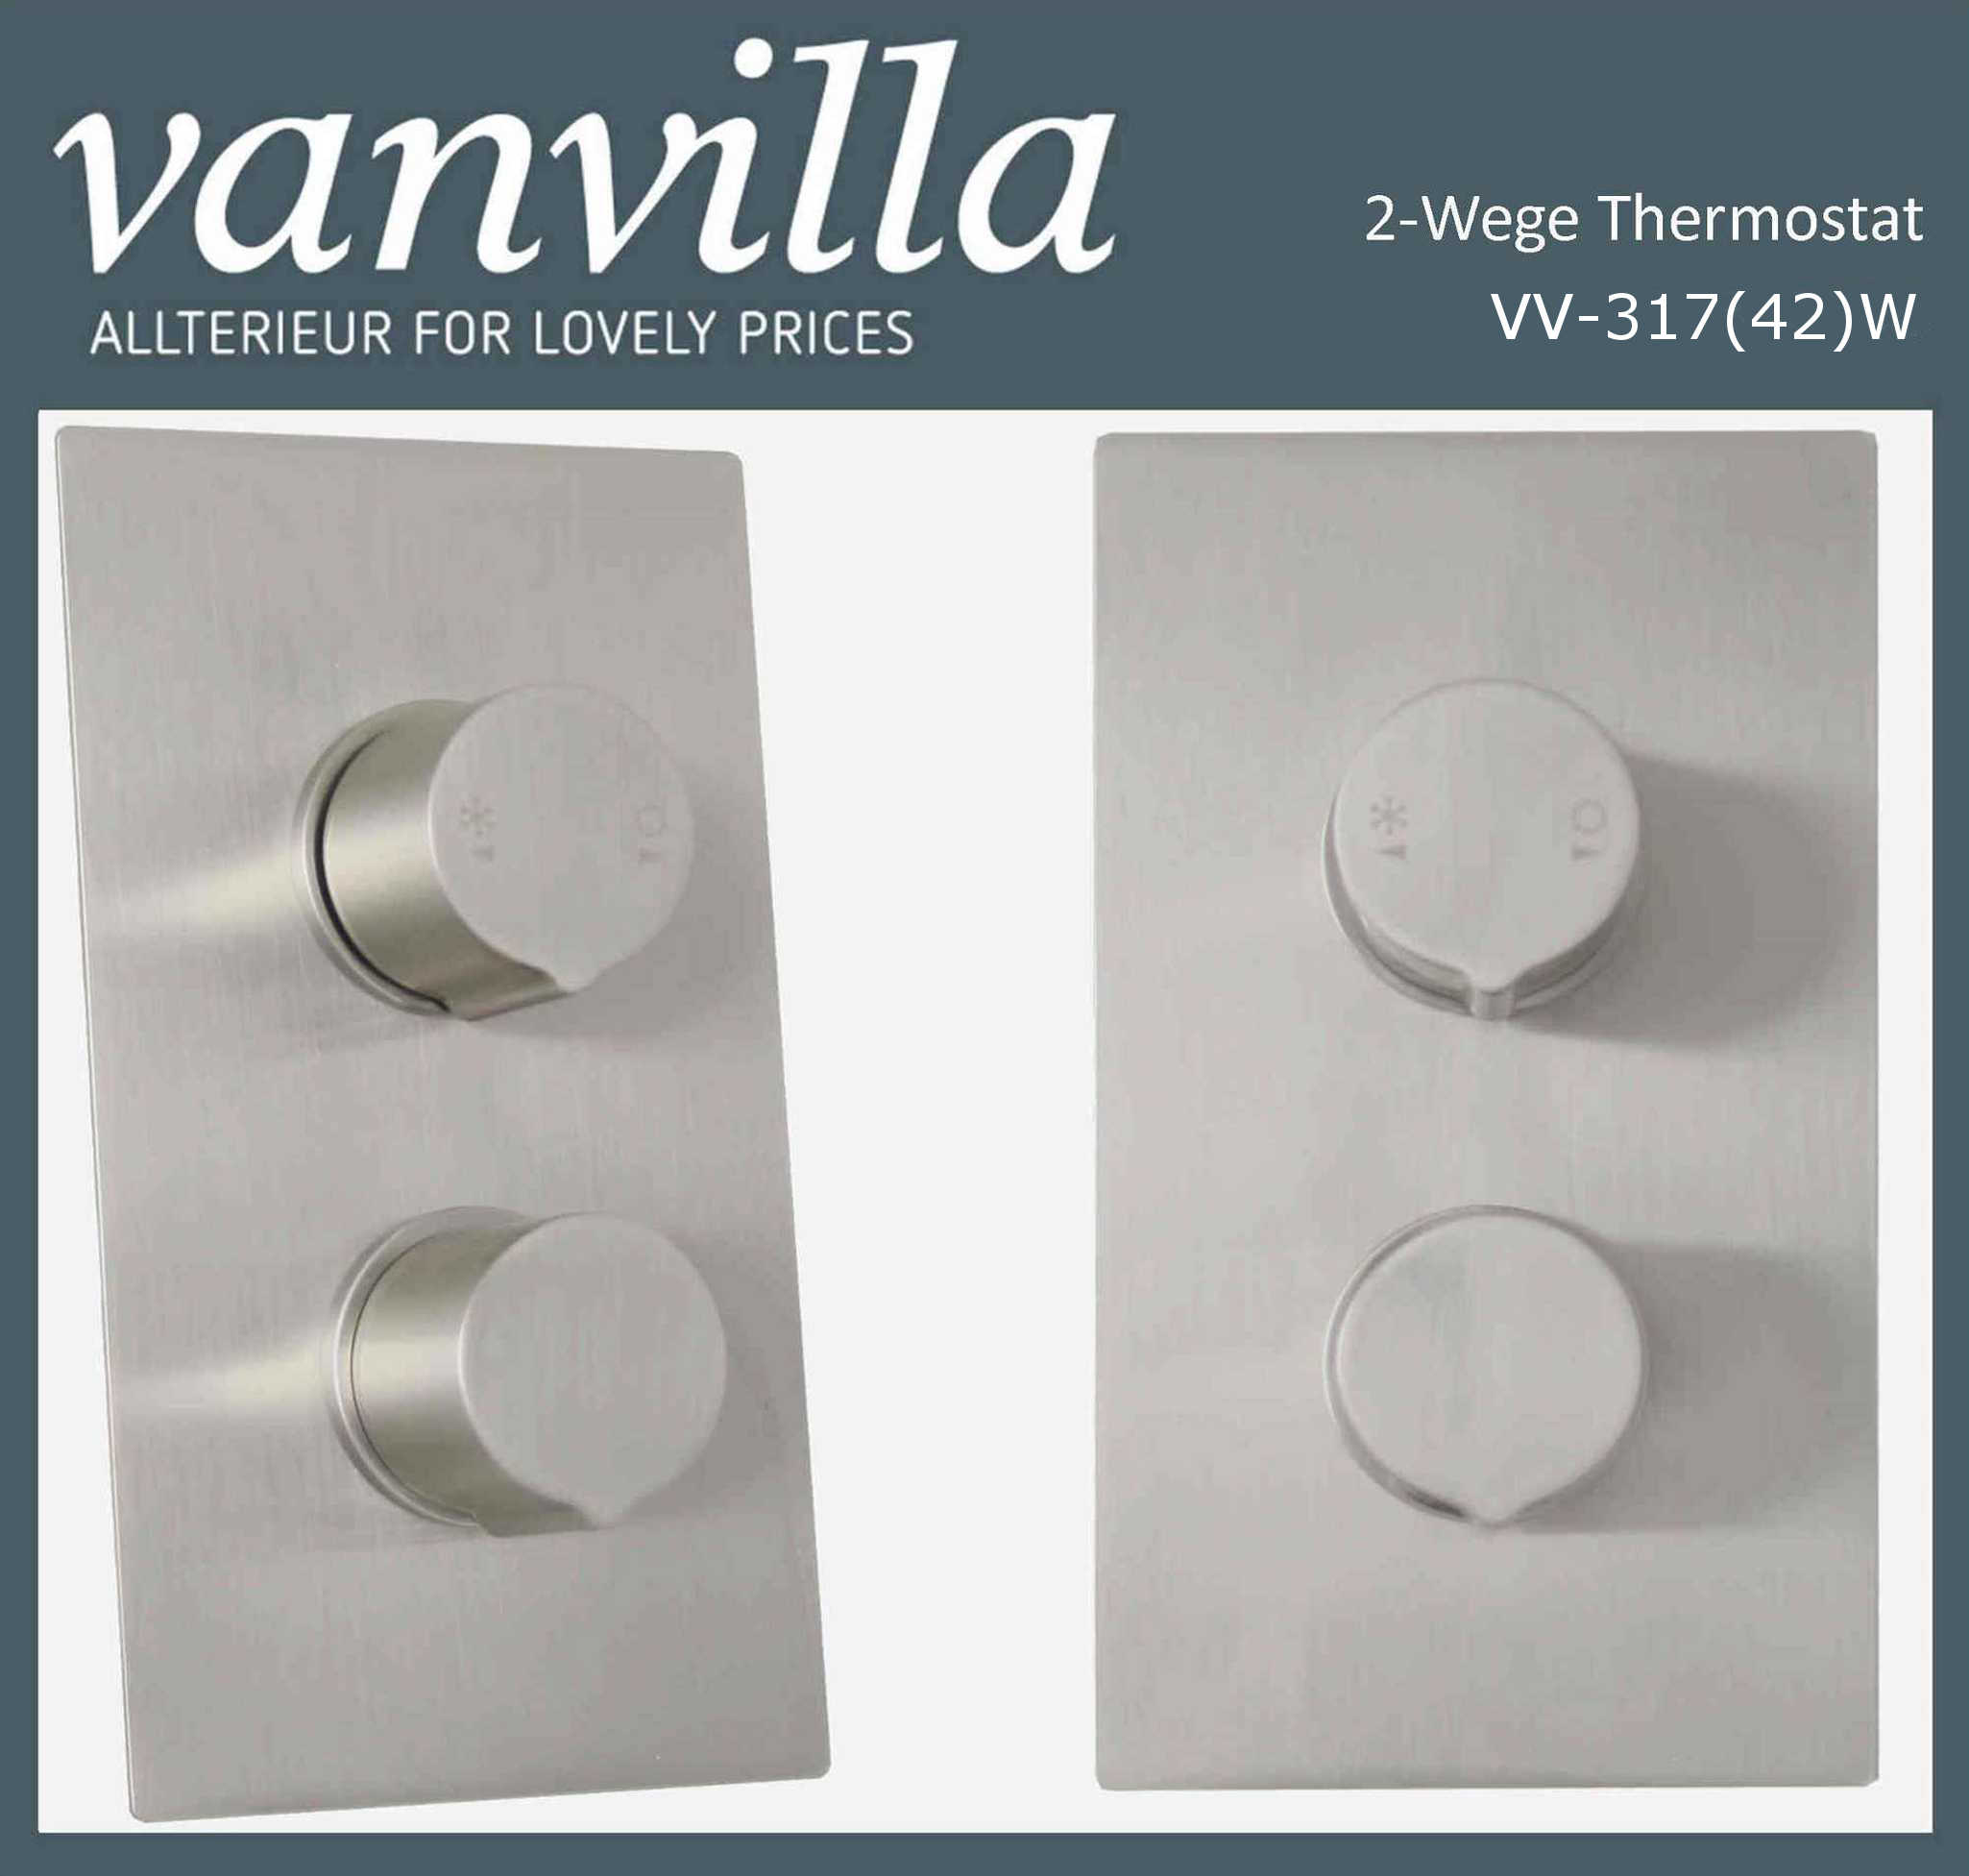 Unterputzarmatur 2-Wege SL0317(42), Thermostat, brushed